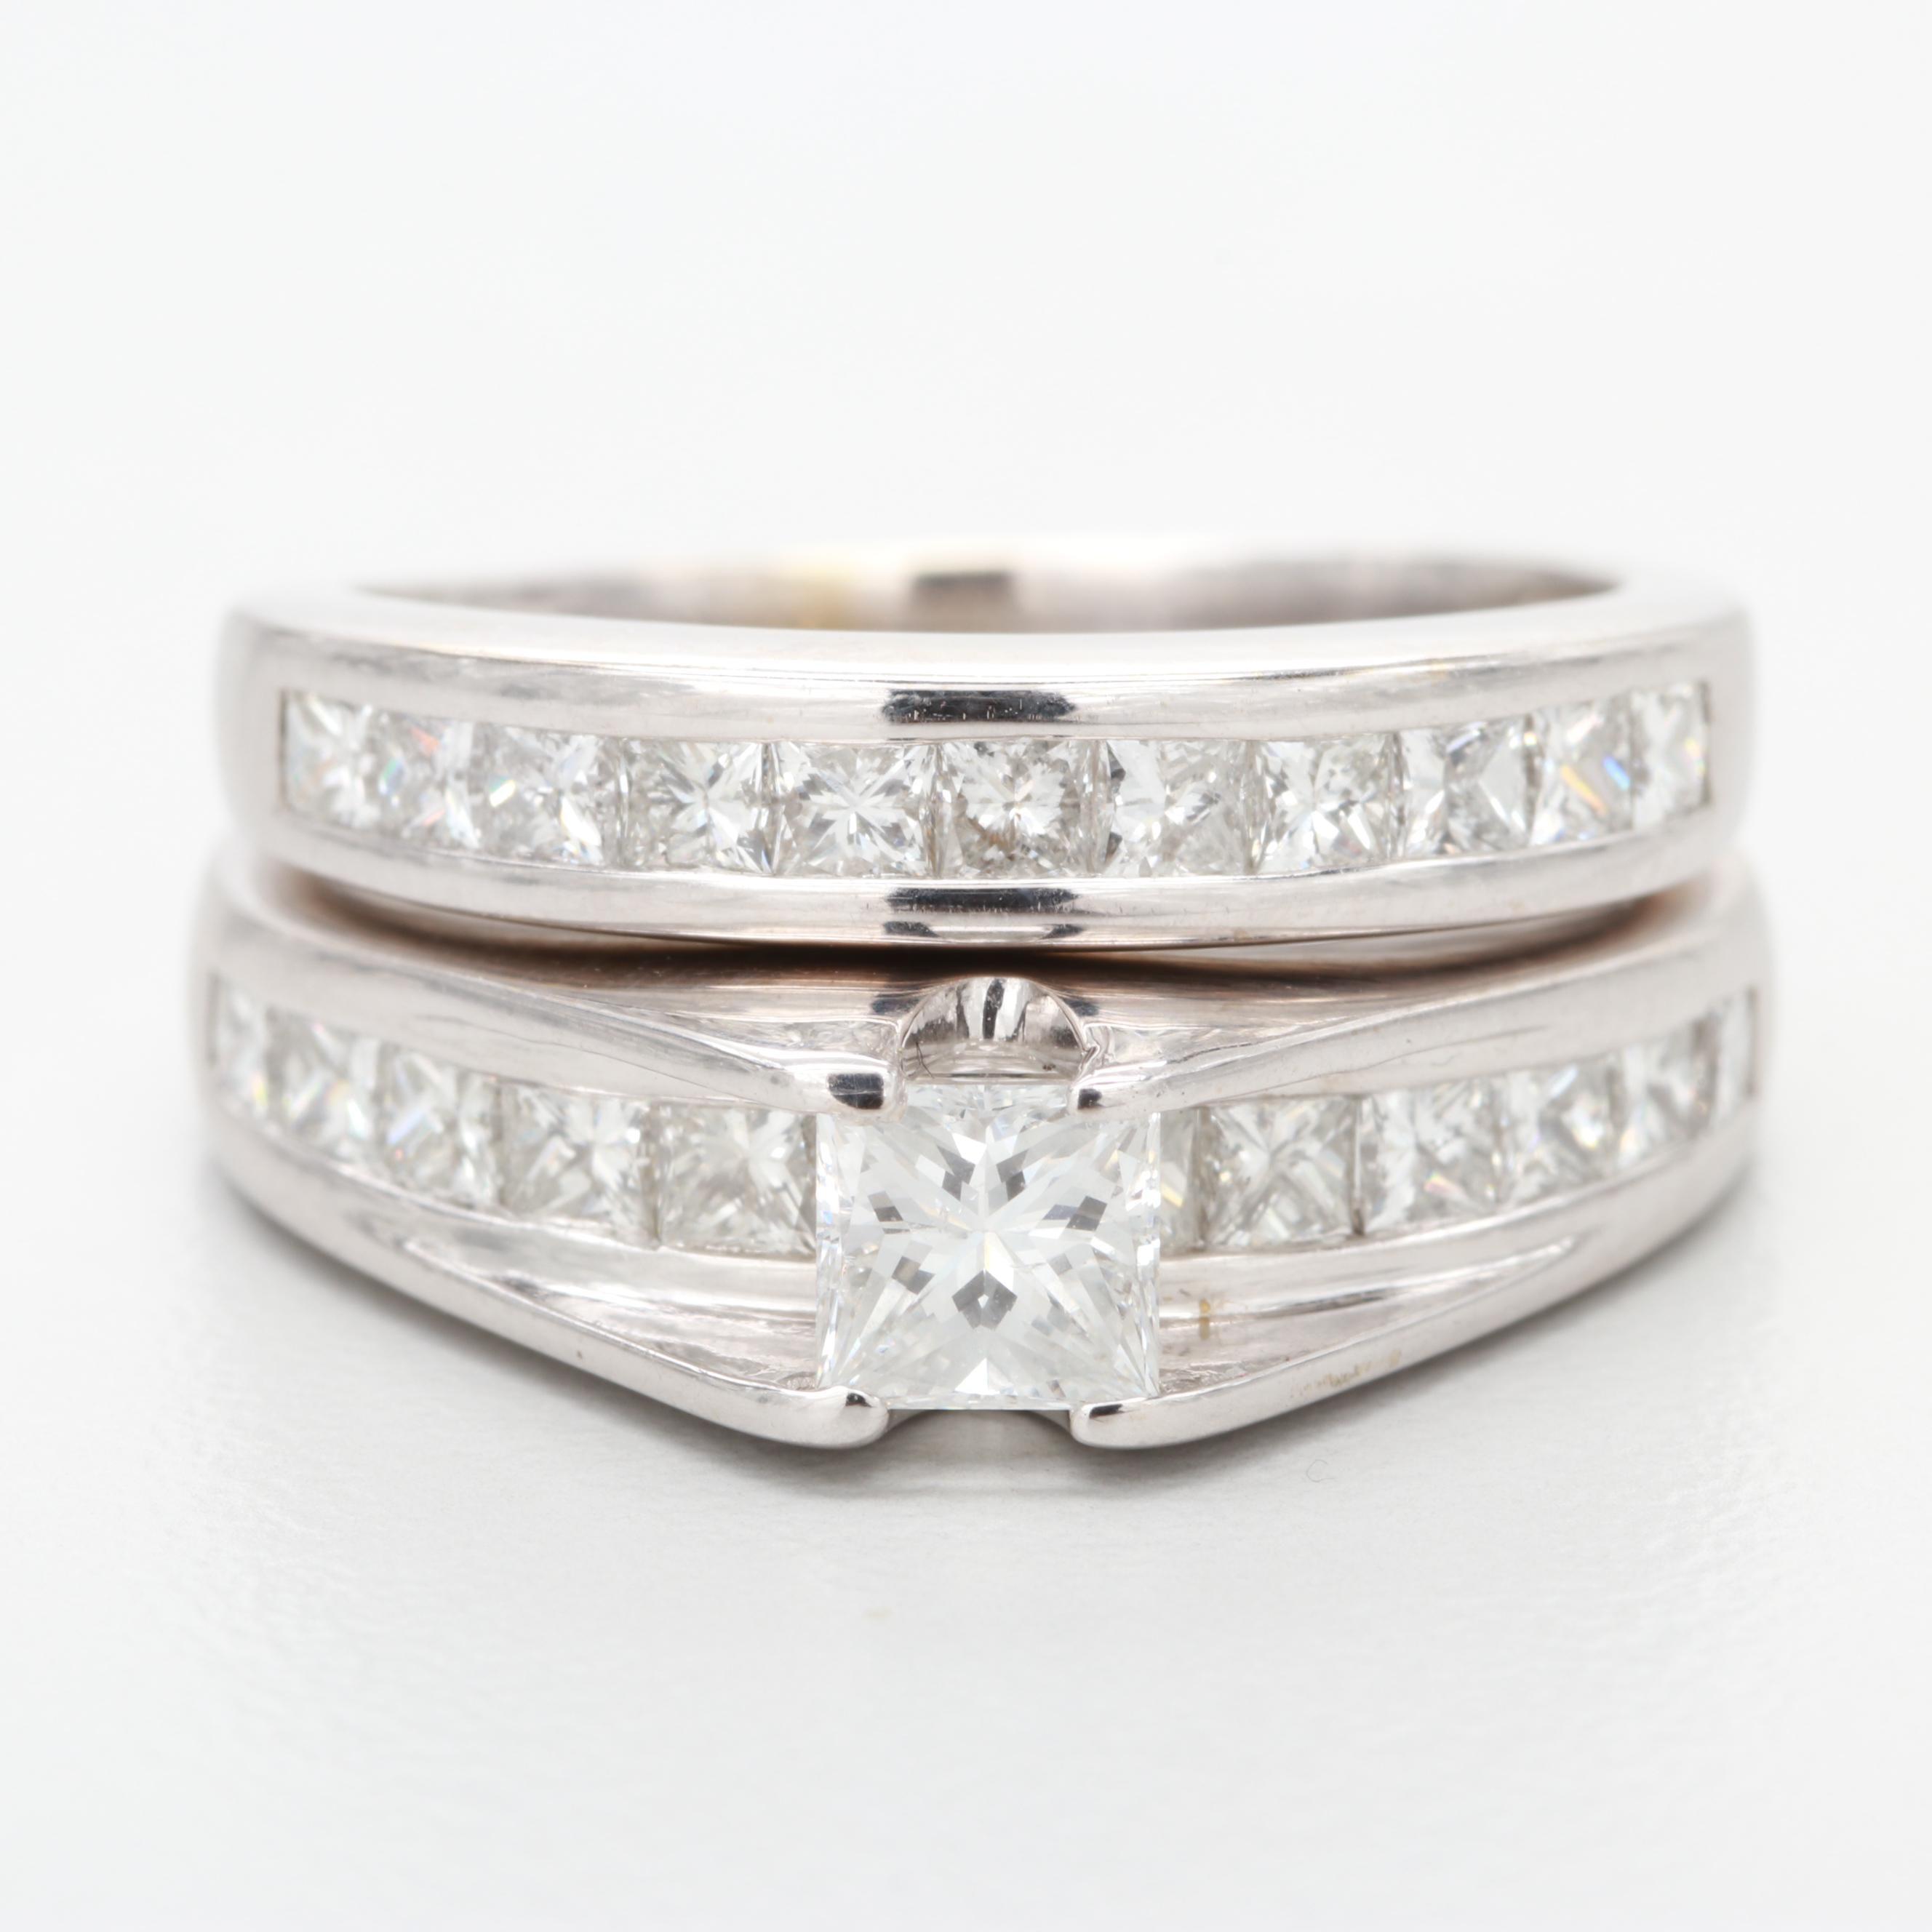 14K and 18K White Gold 1.57 CTW Diamond Ring Set